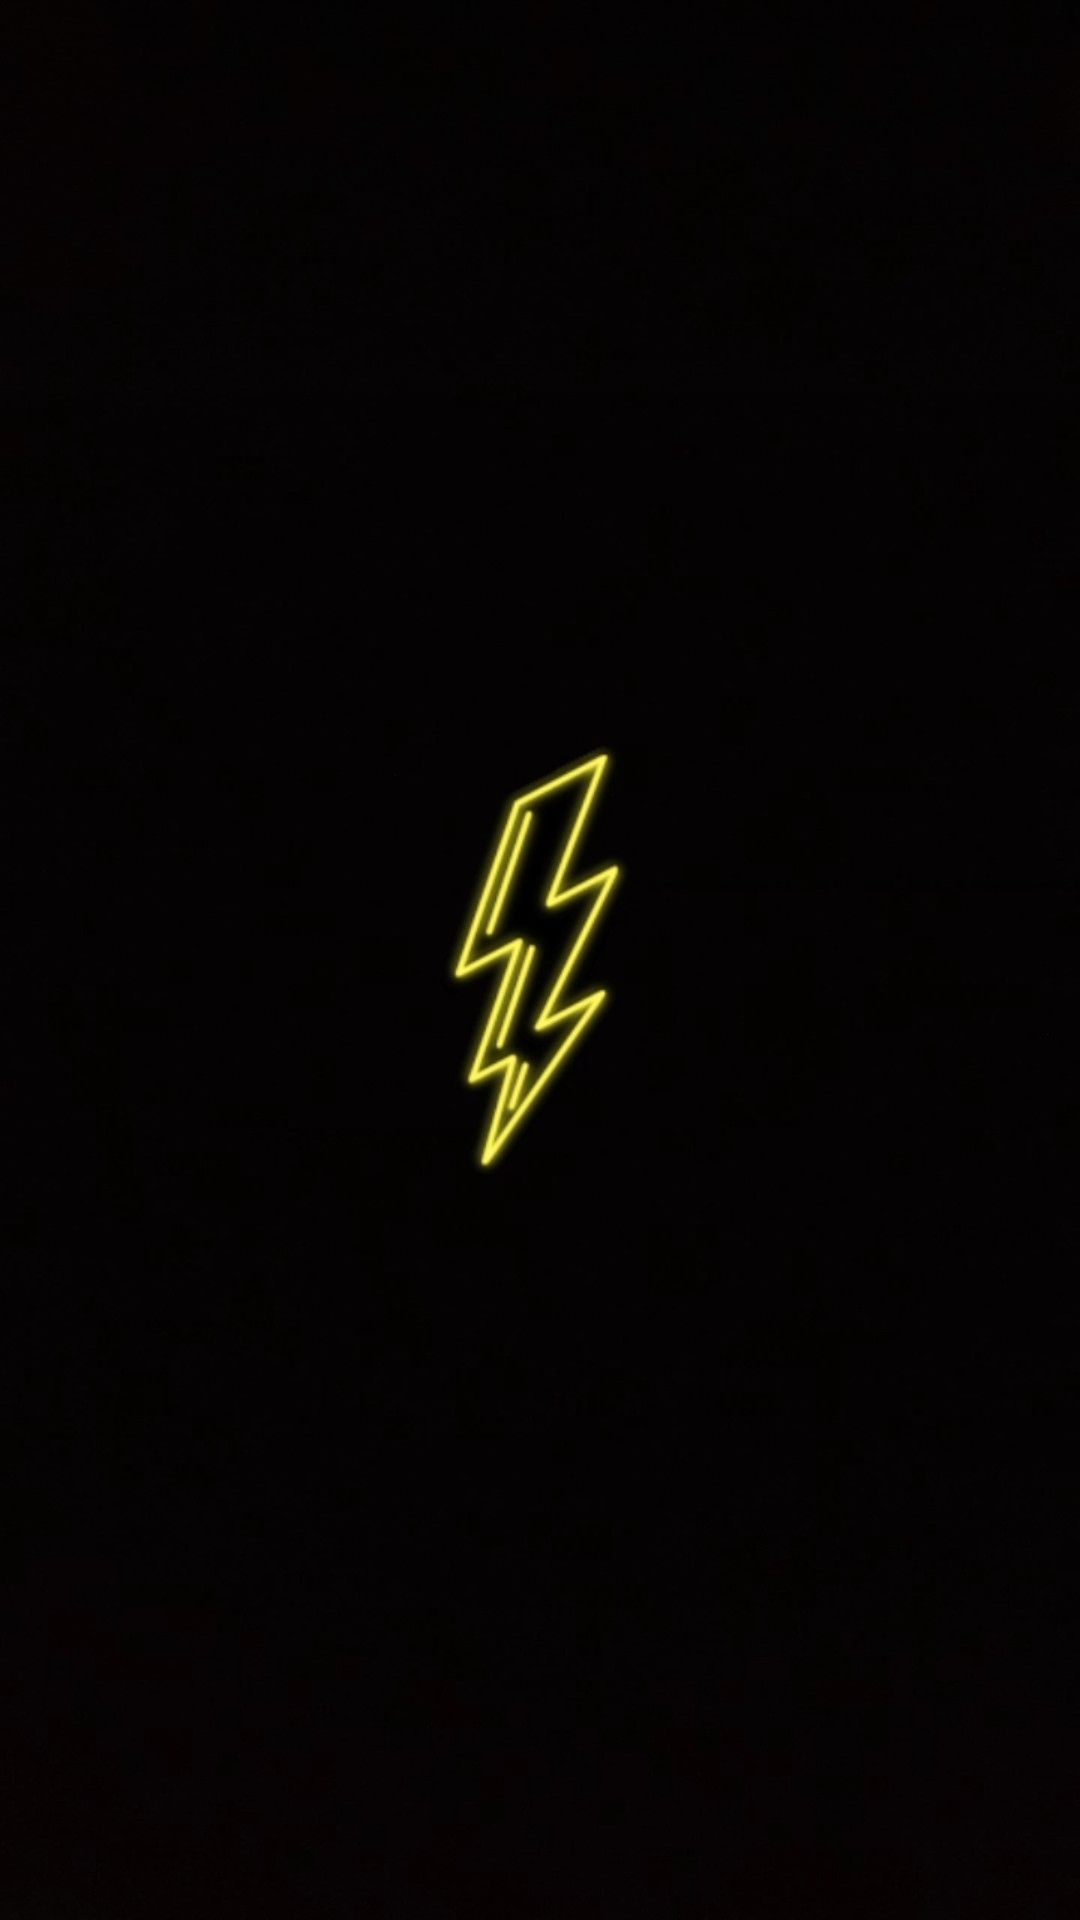 Neon Lightning Wallpapers - Top Free